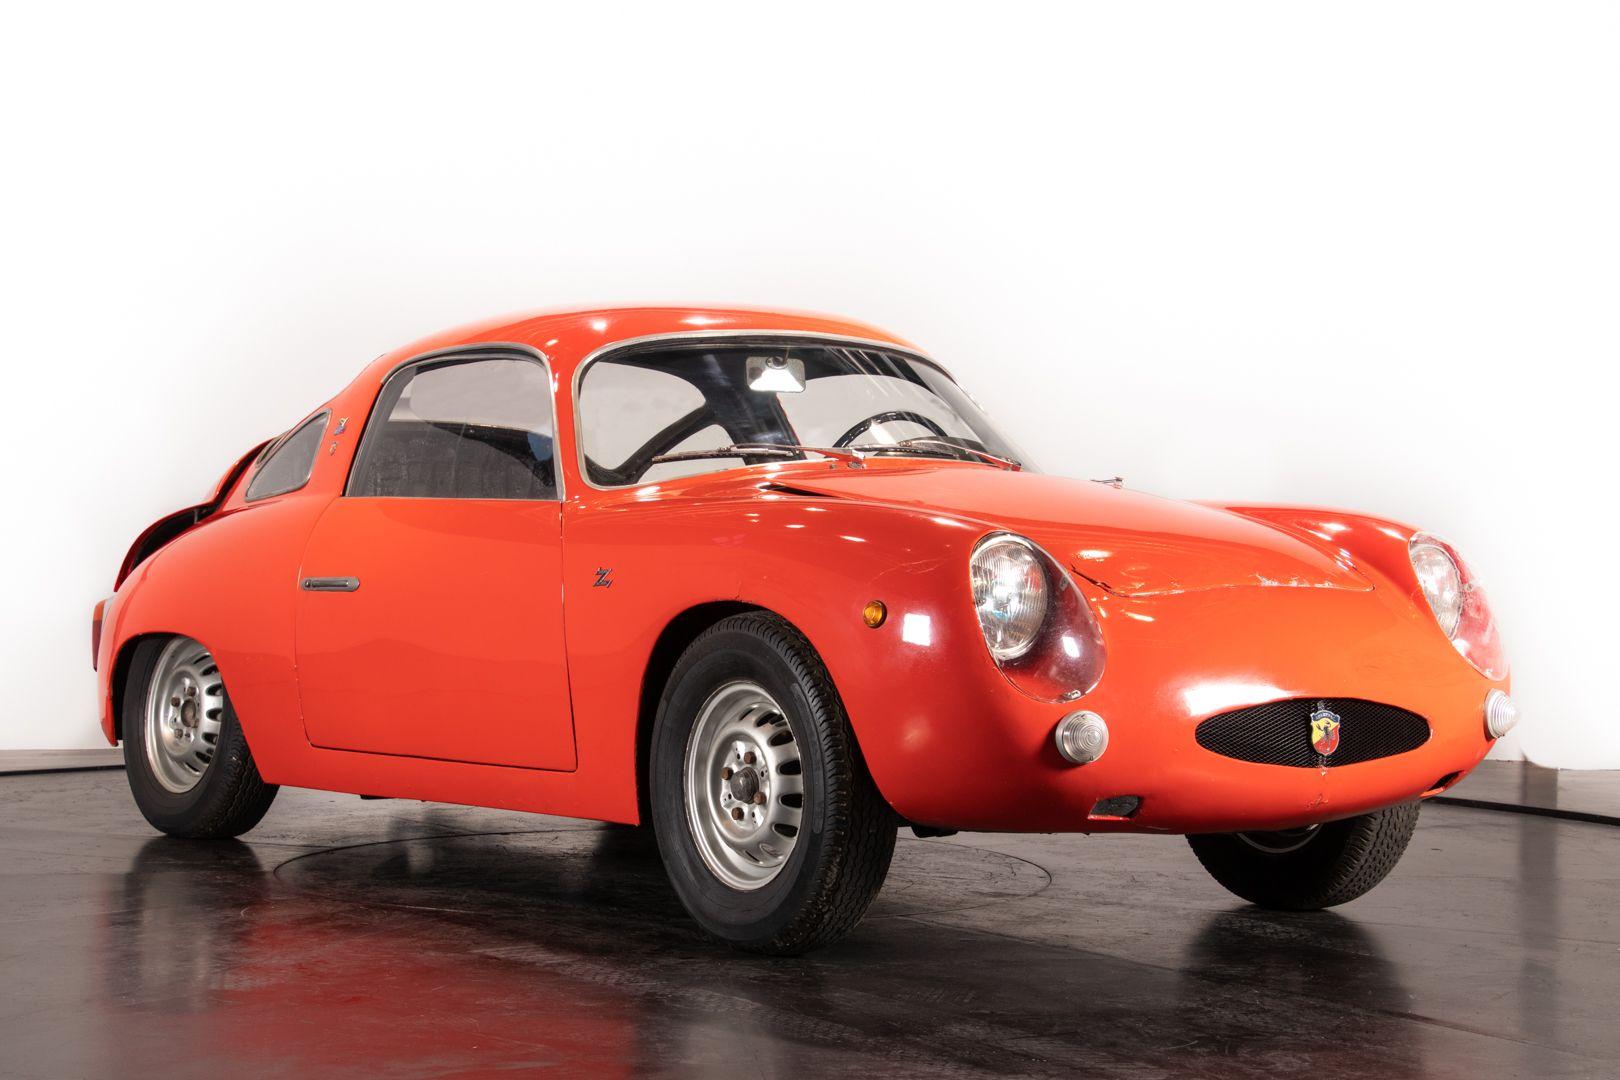 1960 Fiat Abarth 750 Bialbero record Monza 33315